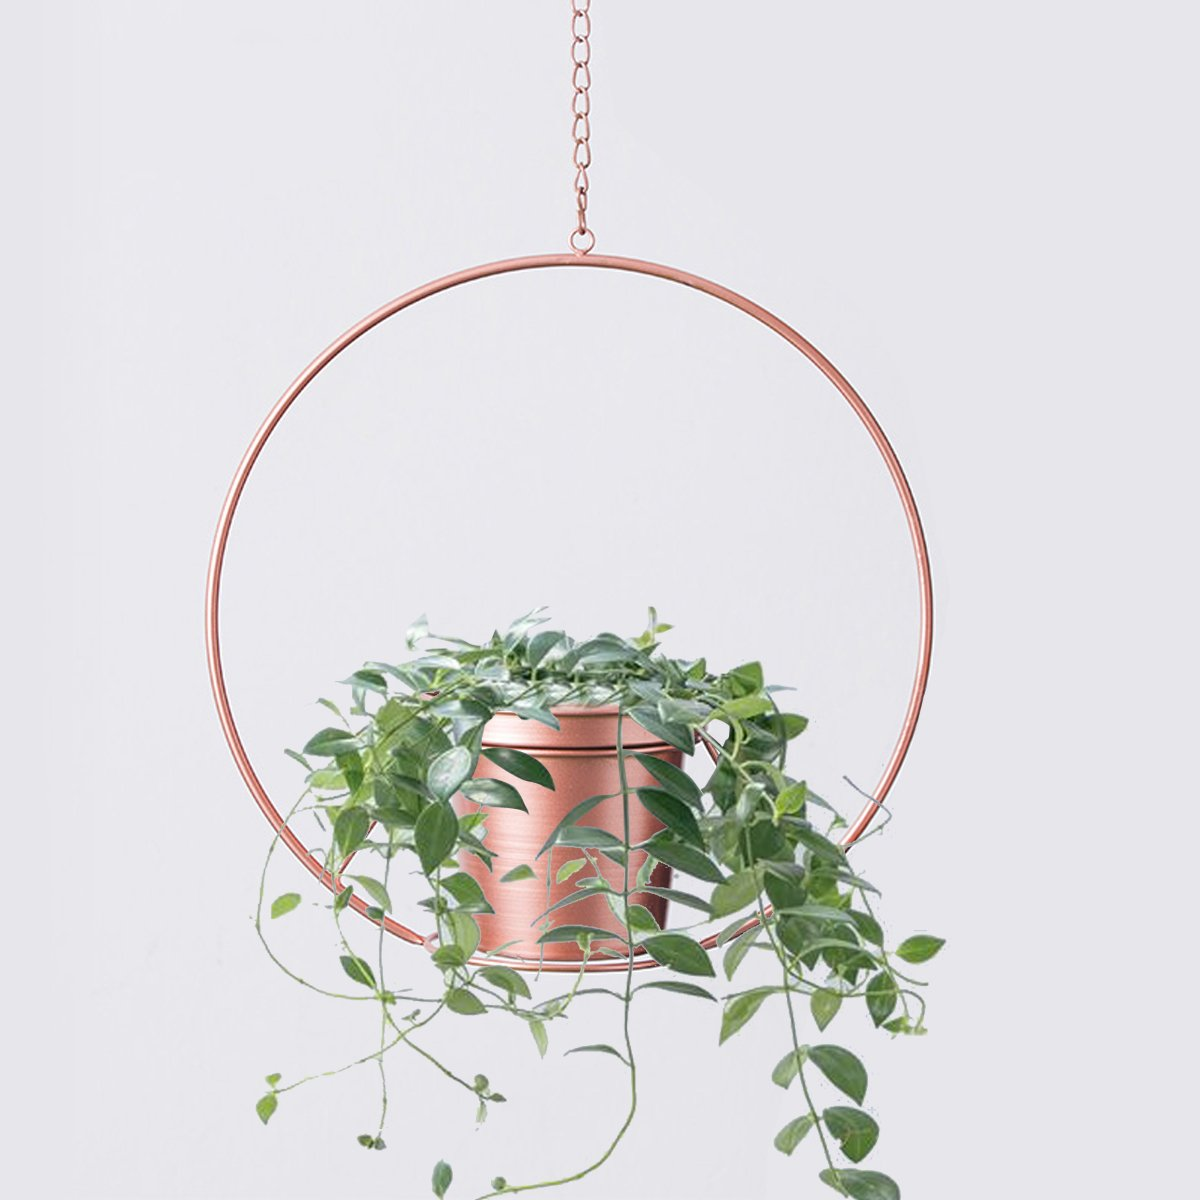 RISEON Boho Rose Gold Metal Plant Hanger,Metal Round Hanging Planter, Modern Planter, Mid Century Plant Holder, Minimalist Planter for Indoor Outdoor Home Decor